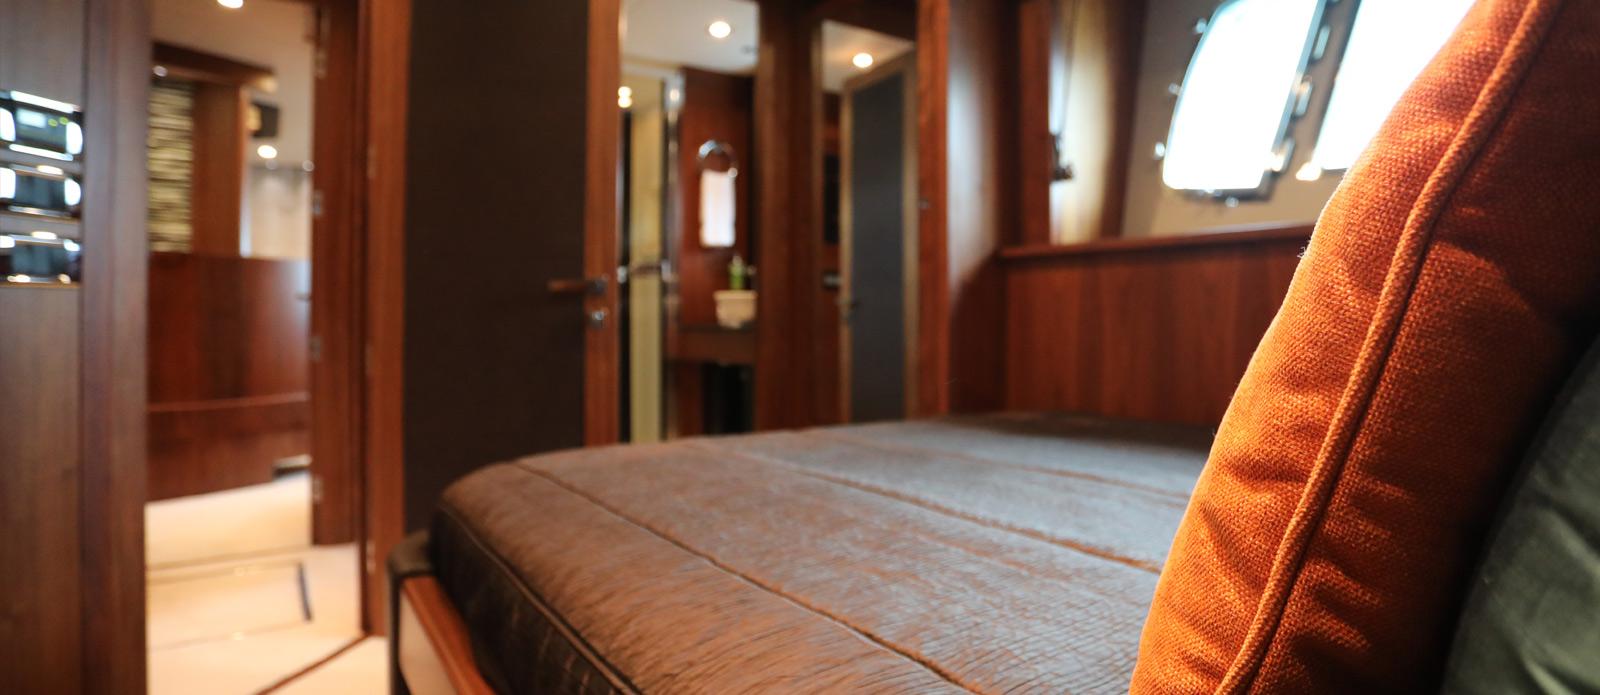 Sunseeker-30-Metre-Yacht-Coraysa-Double-Cabin